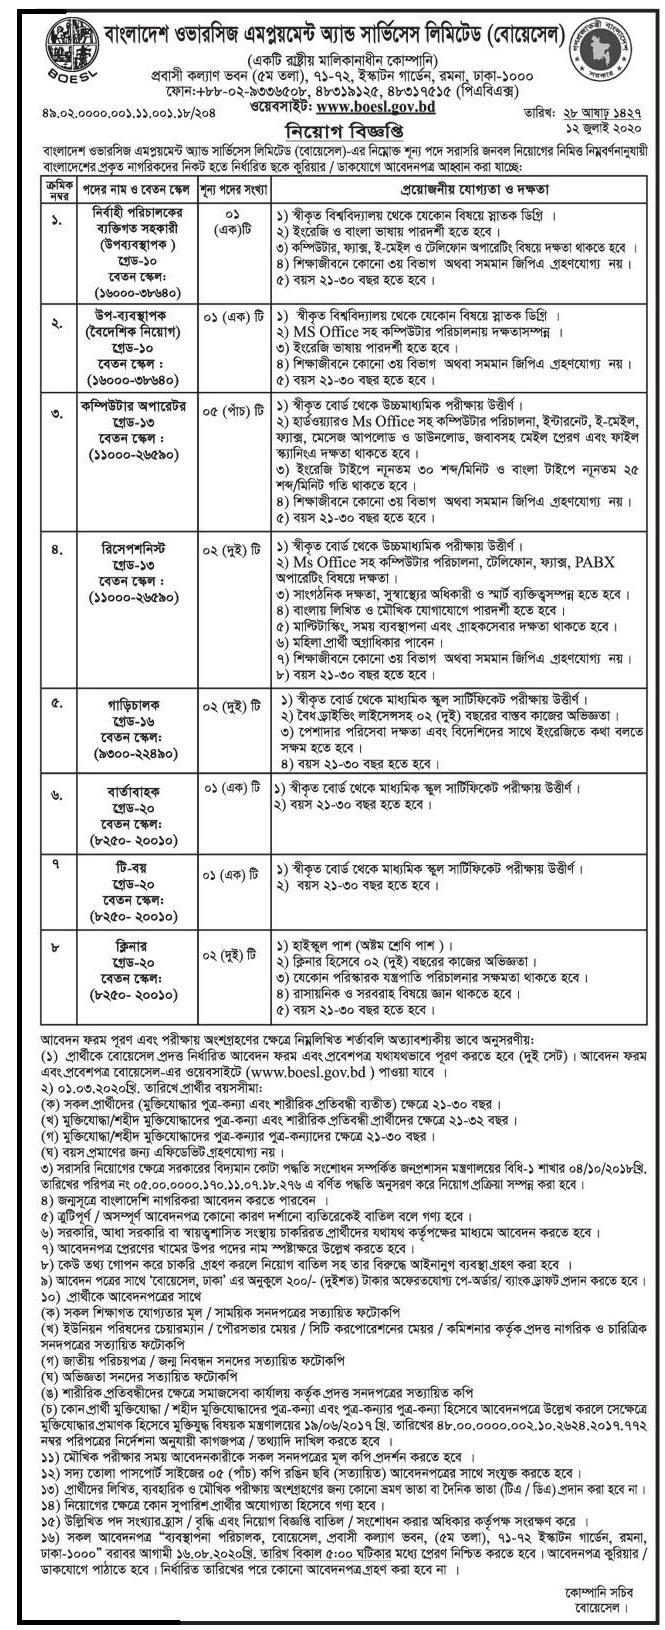 Bangladesh Overseas Employment and Services Ltd Job Circular 2020